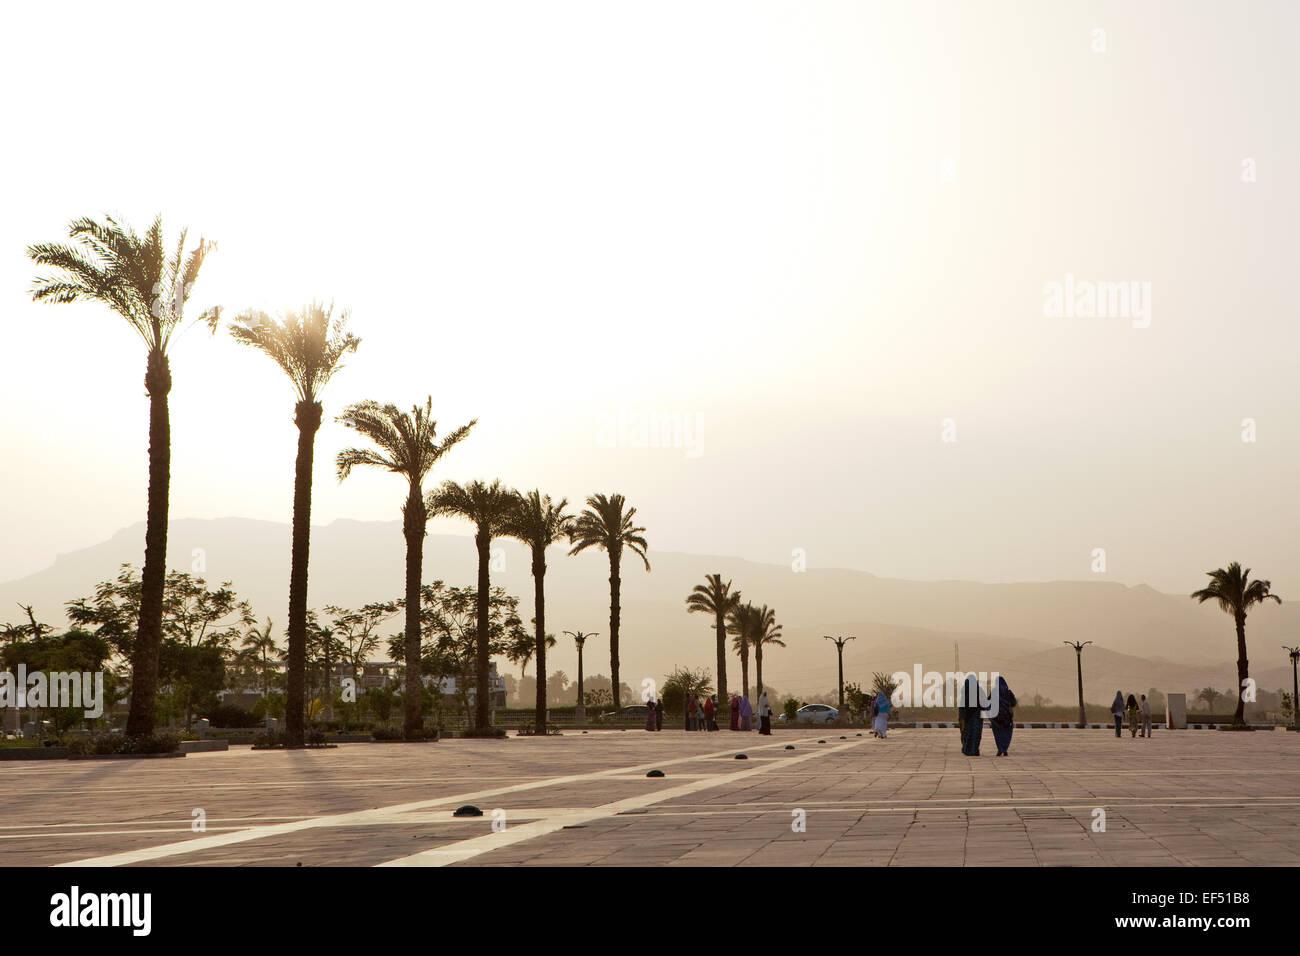 Avenue in Egypt - Stock Image